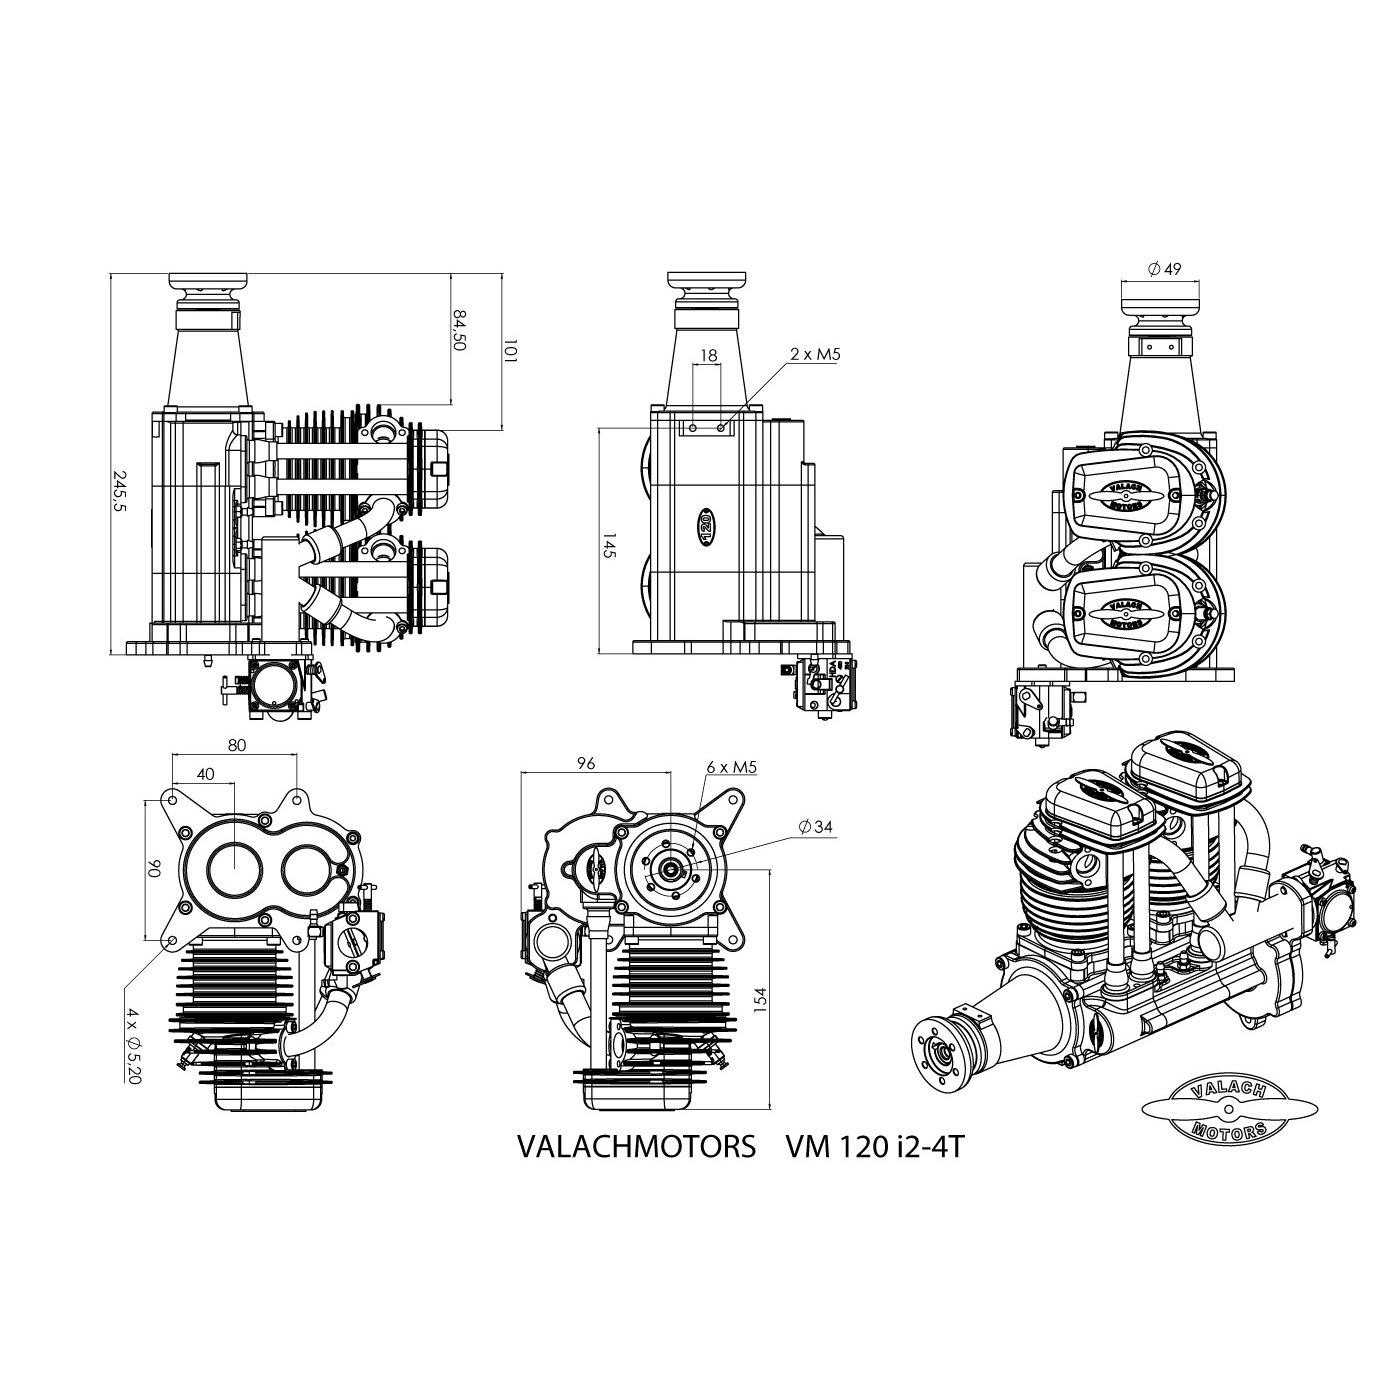 Double End Carburetor Linkage 3 1 2 Inches Long 7053 also Edelbrock Carburetor Linkage additionally 271930979327 likewise Edelbrock 1406 Carburetor Linkage likewise Fuel Pump Carburetor Engines Holly. on carburetor linkage clips